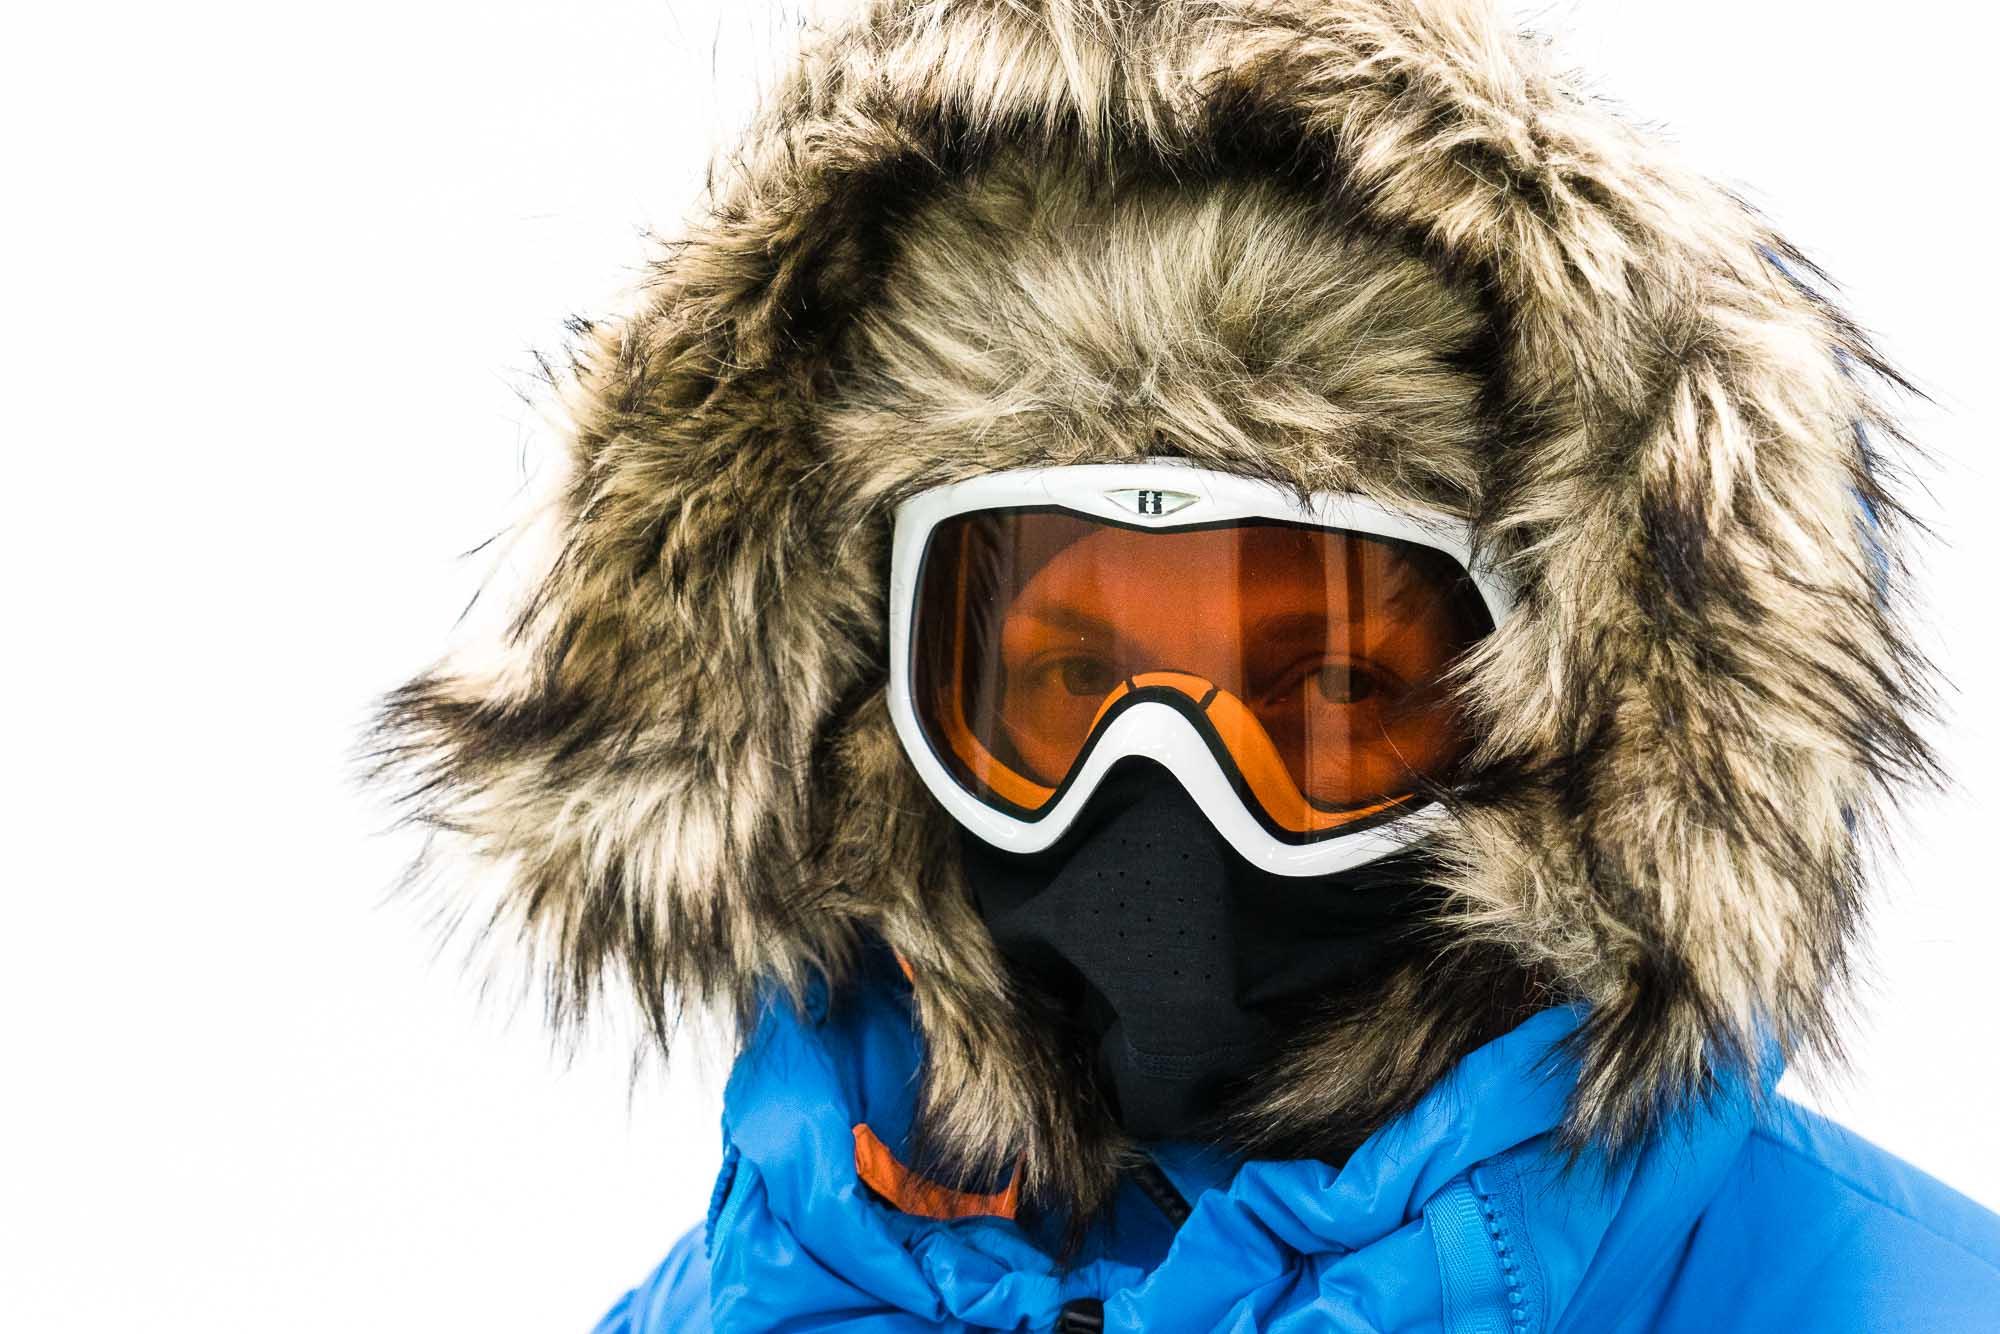 Get dressed for Fjällräven Polar 2018 – The clothing